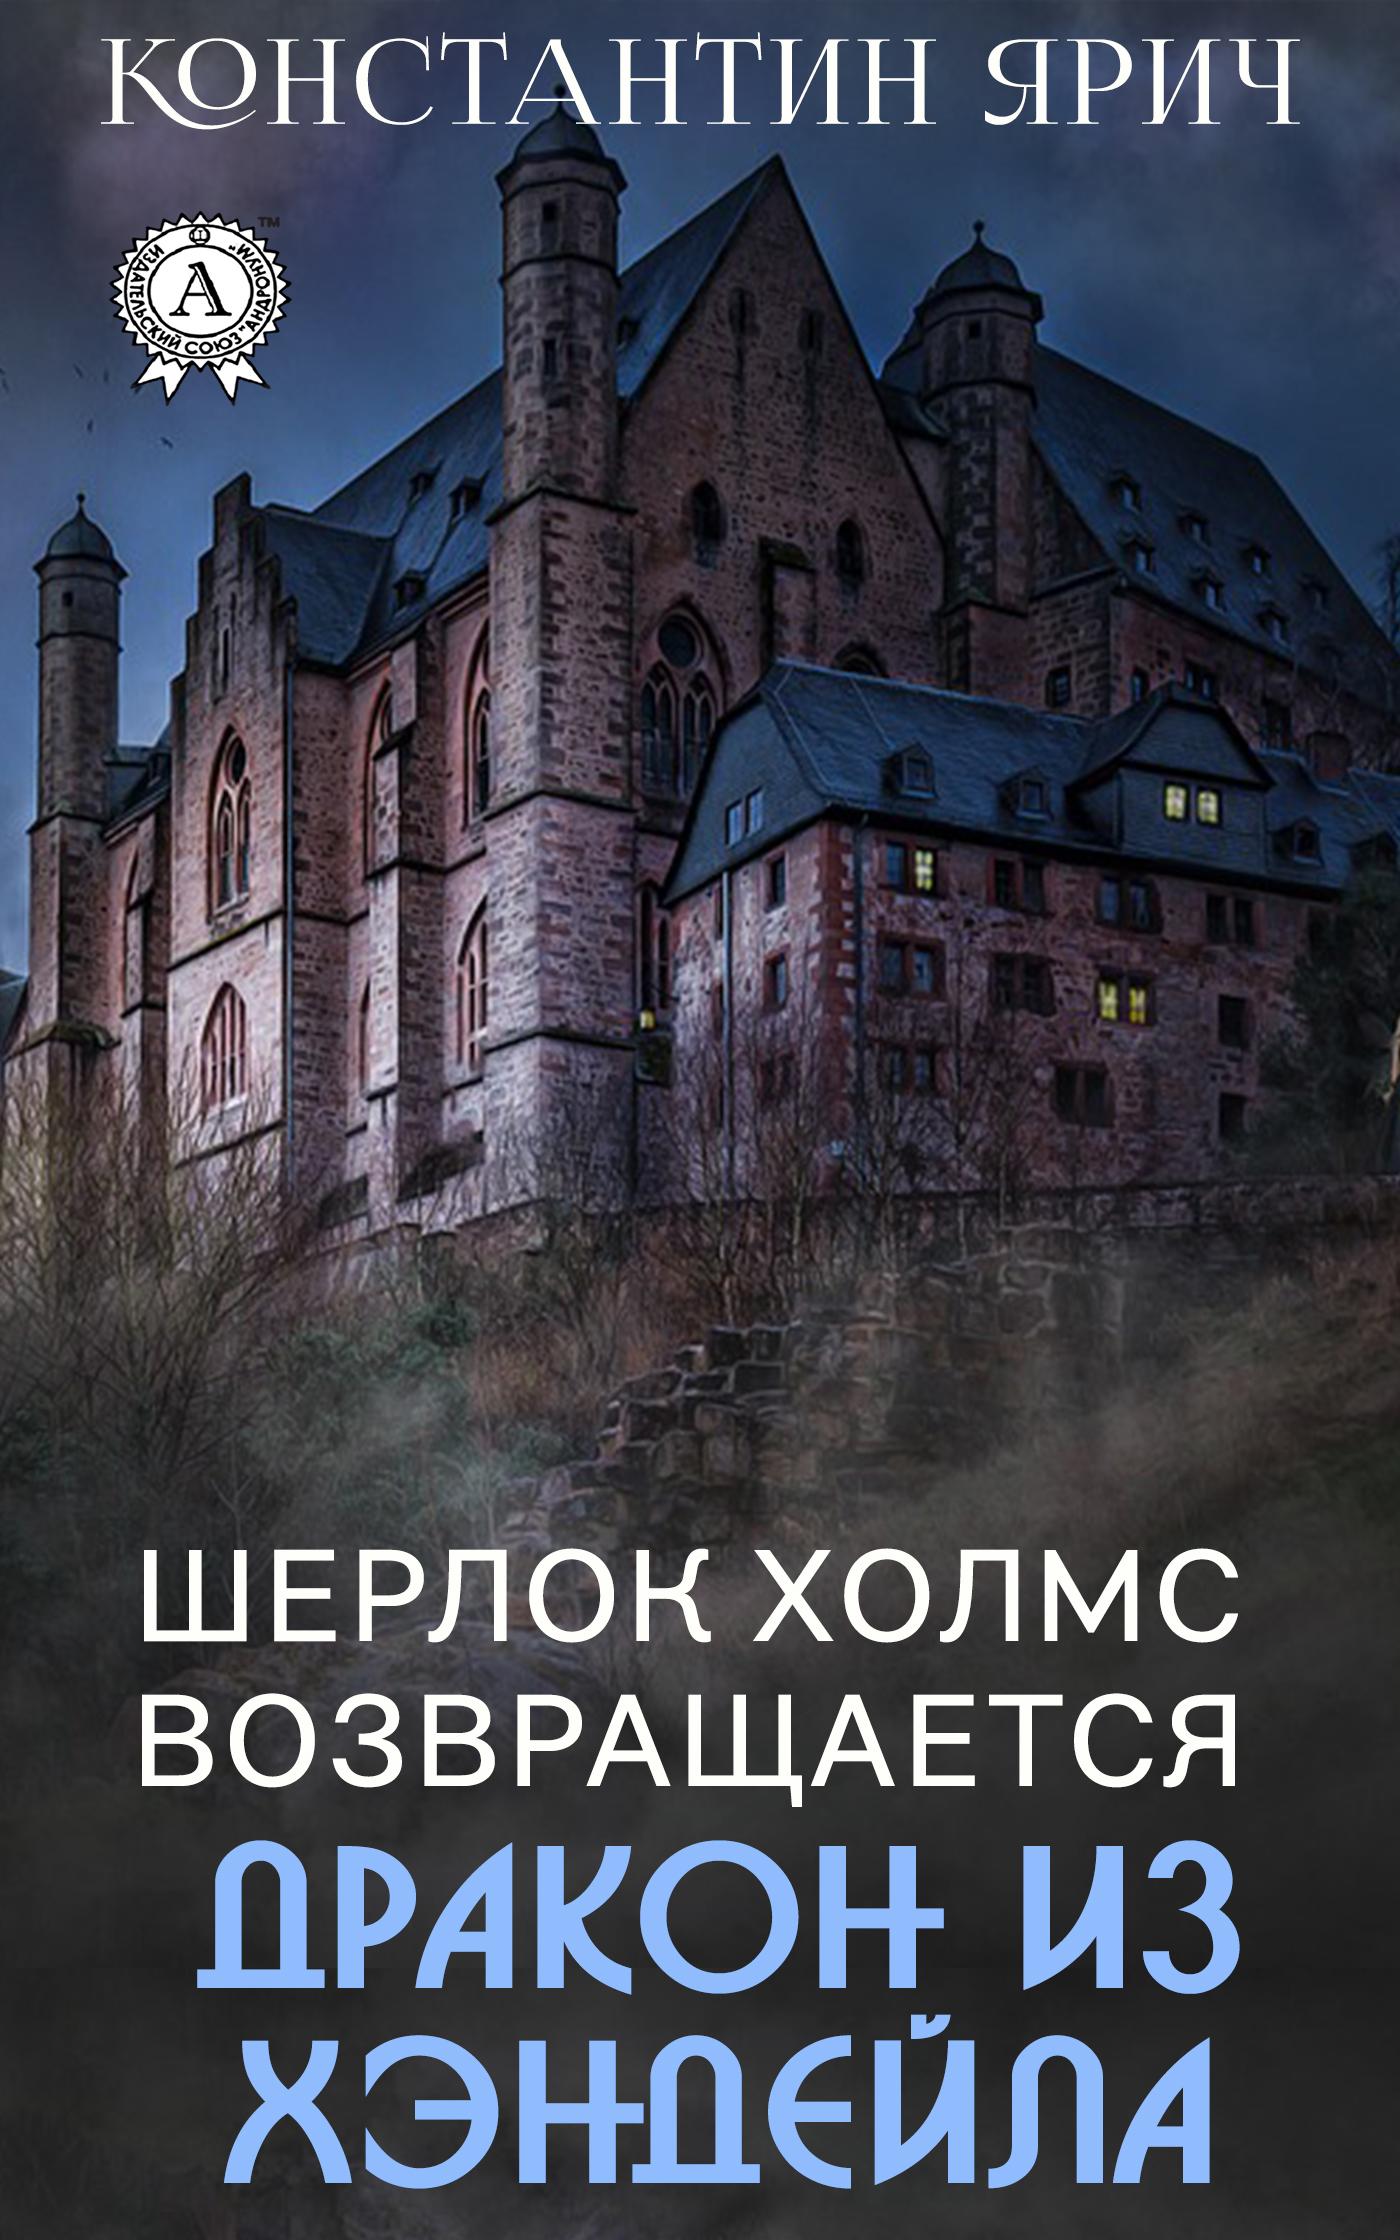 Константин Ярич - Шерлок Холмс возвращается: Дракон из Хэндейла